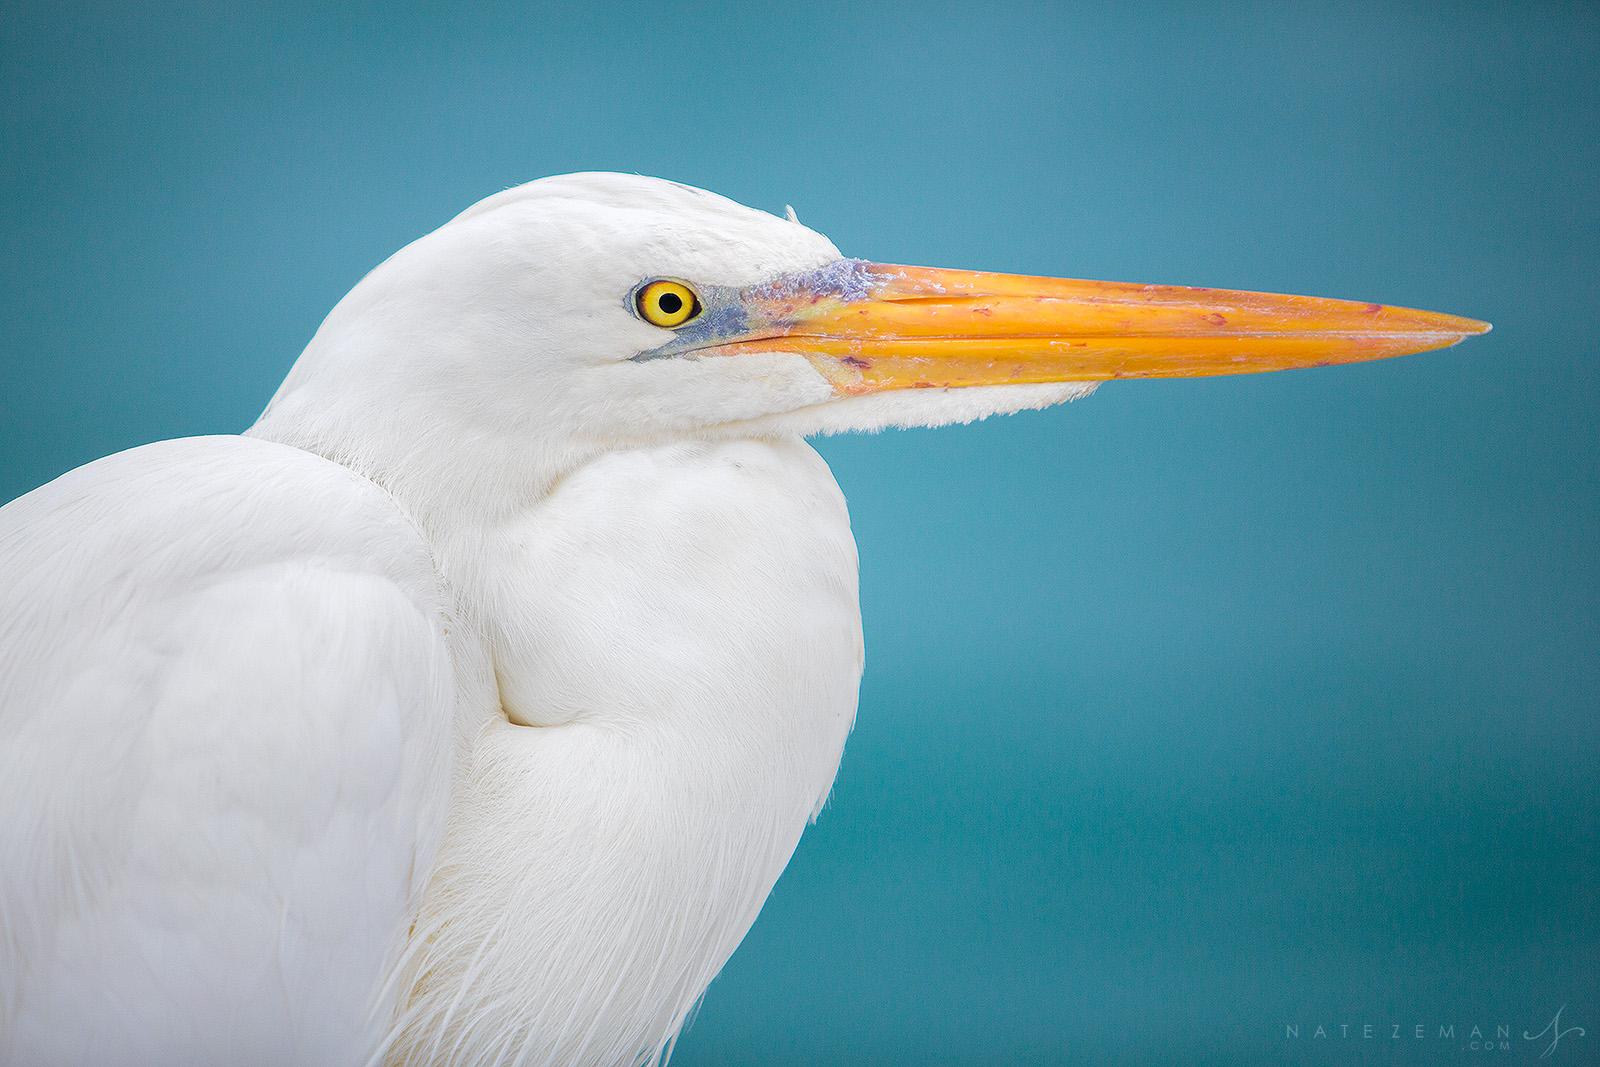 great egret, florida keys, key west, florida, portrait, aqua, blue, water, photo